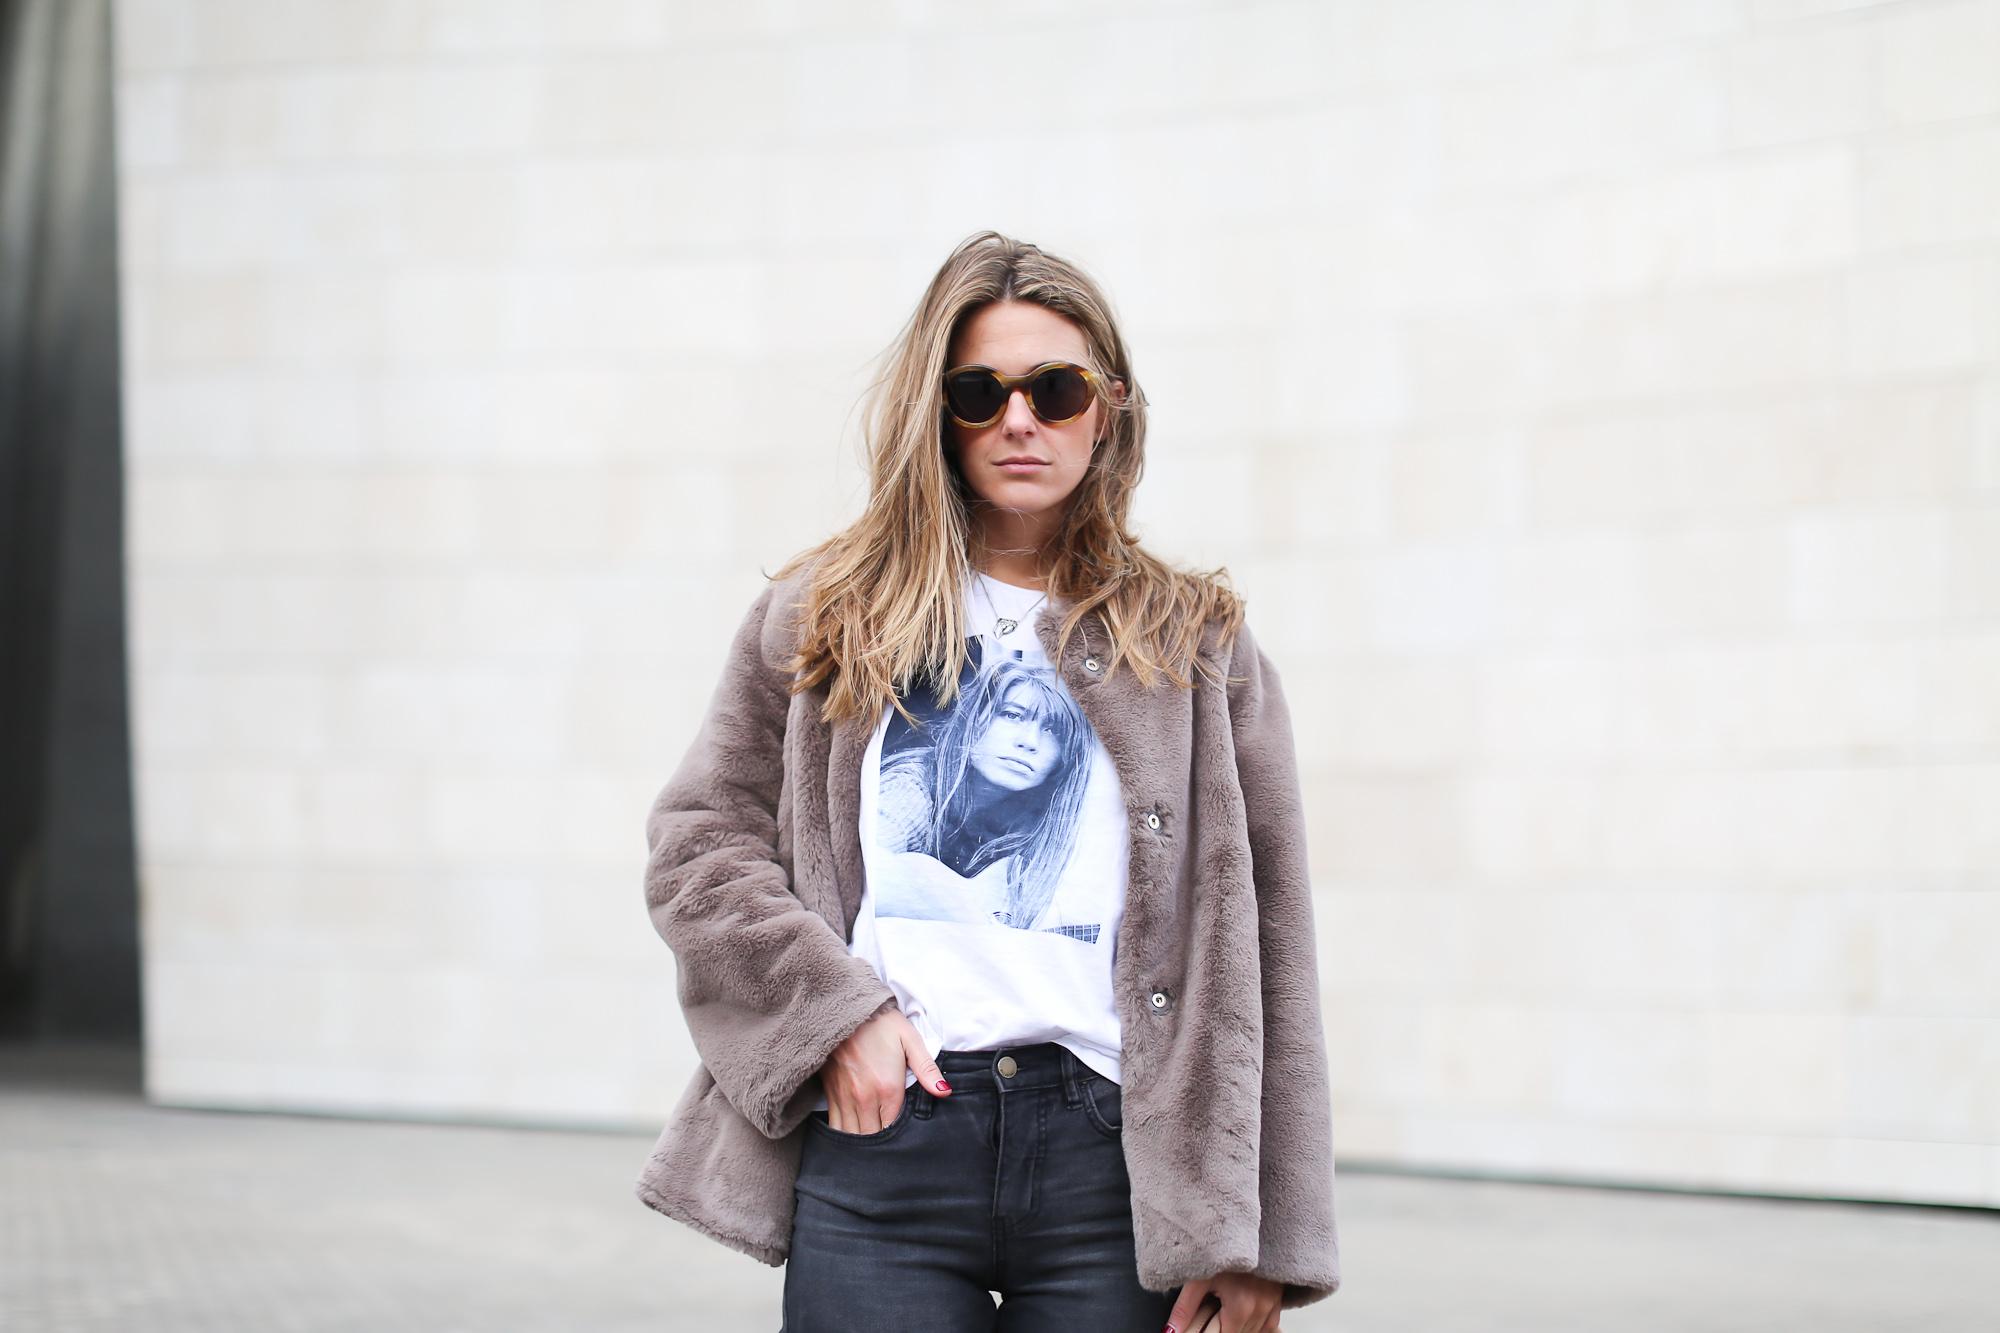 Clochet_streetstyle_fashionblogger_bilbao_guggenheim_purificaciongarcia_bolsoante_adidasgazelle-5